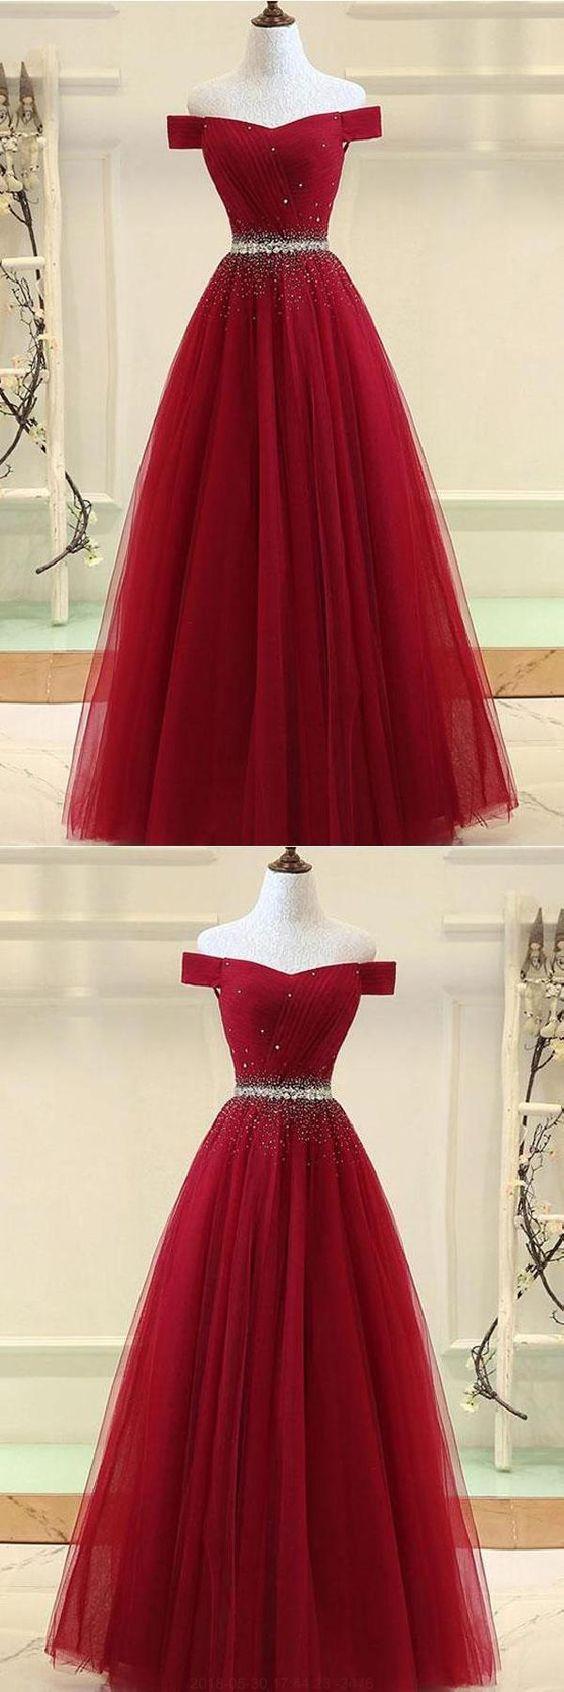 Prom dresses promdresses prom dresses aline